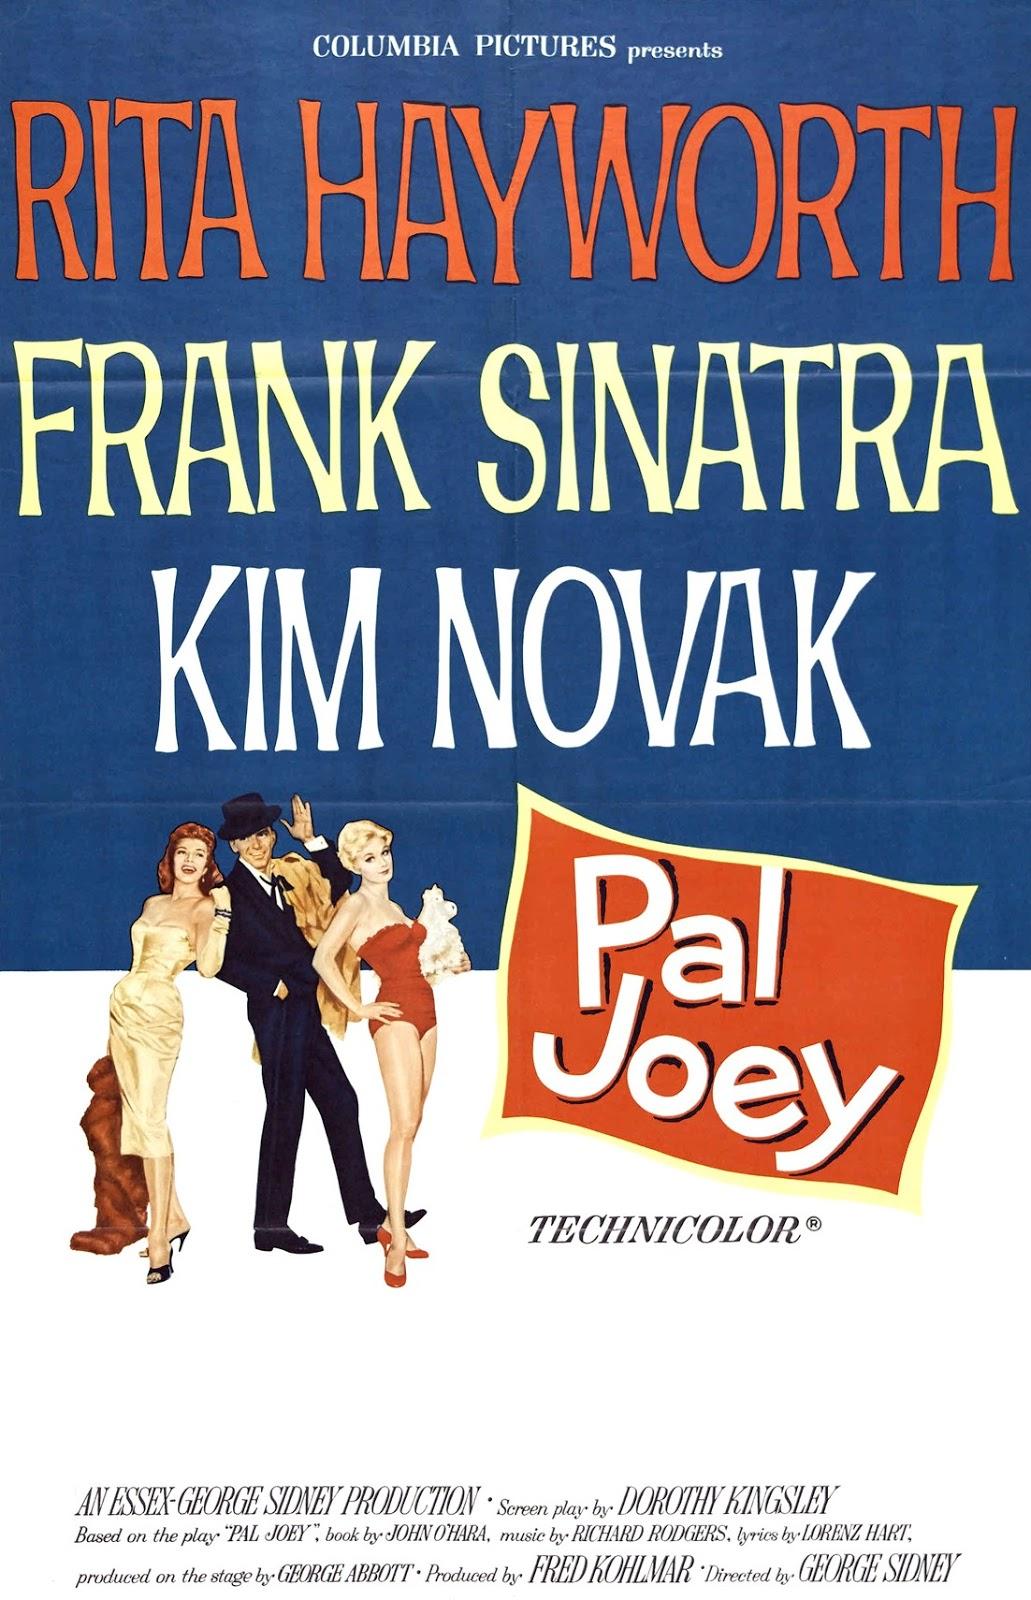 Back to Golden Days: Film Friday: Having Wonderful Time